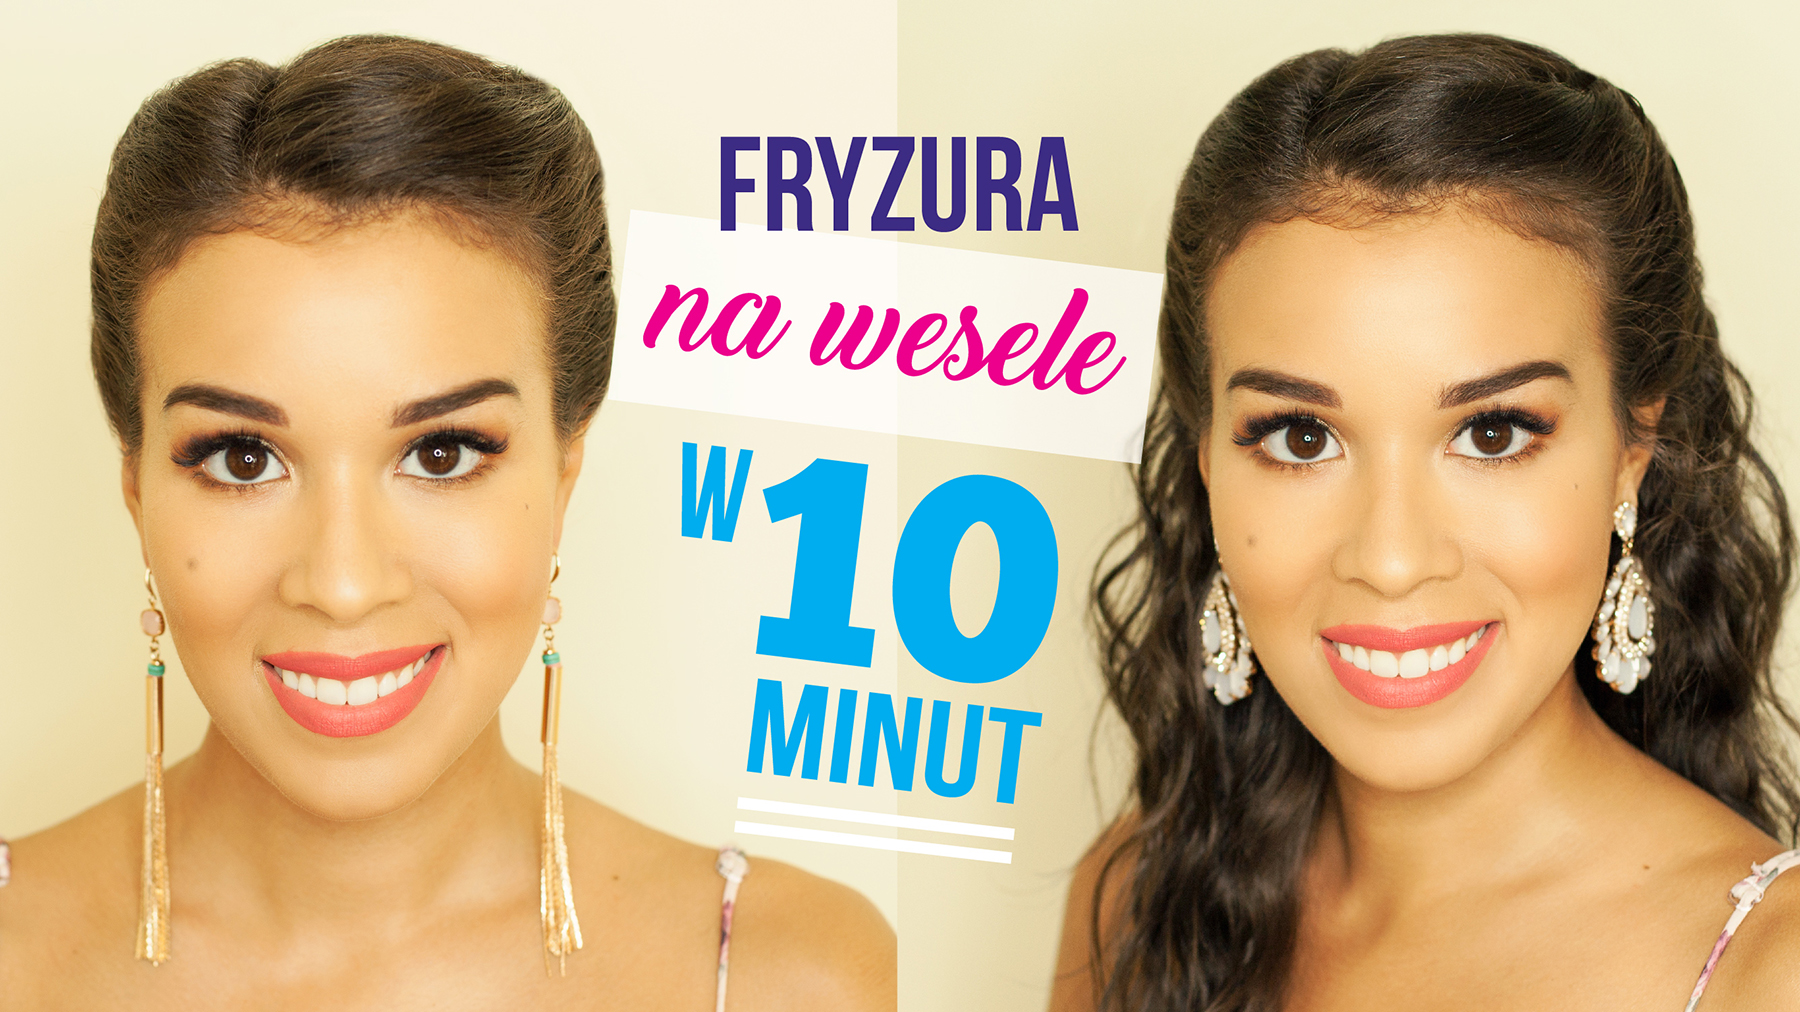 Wideo Fryzura Na Wesele W 10 Minut Macademian Girl